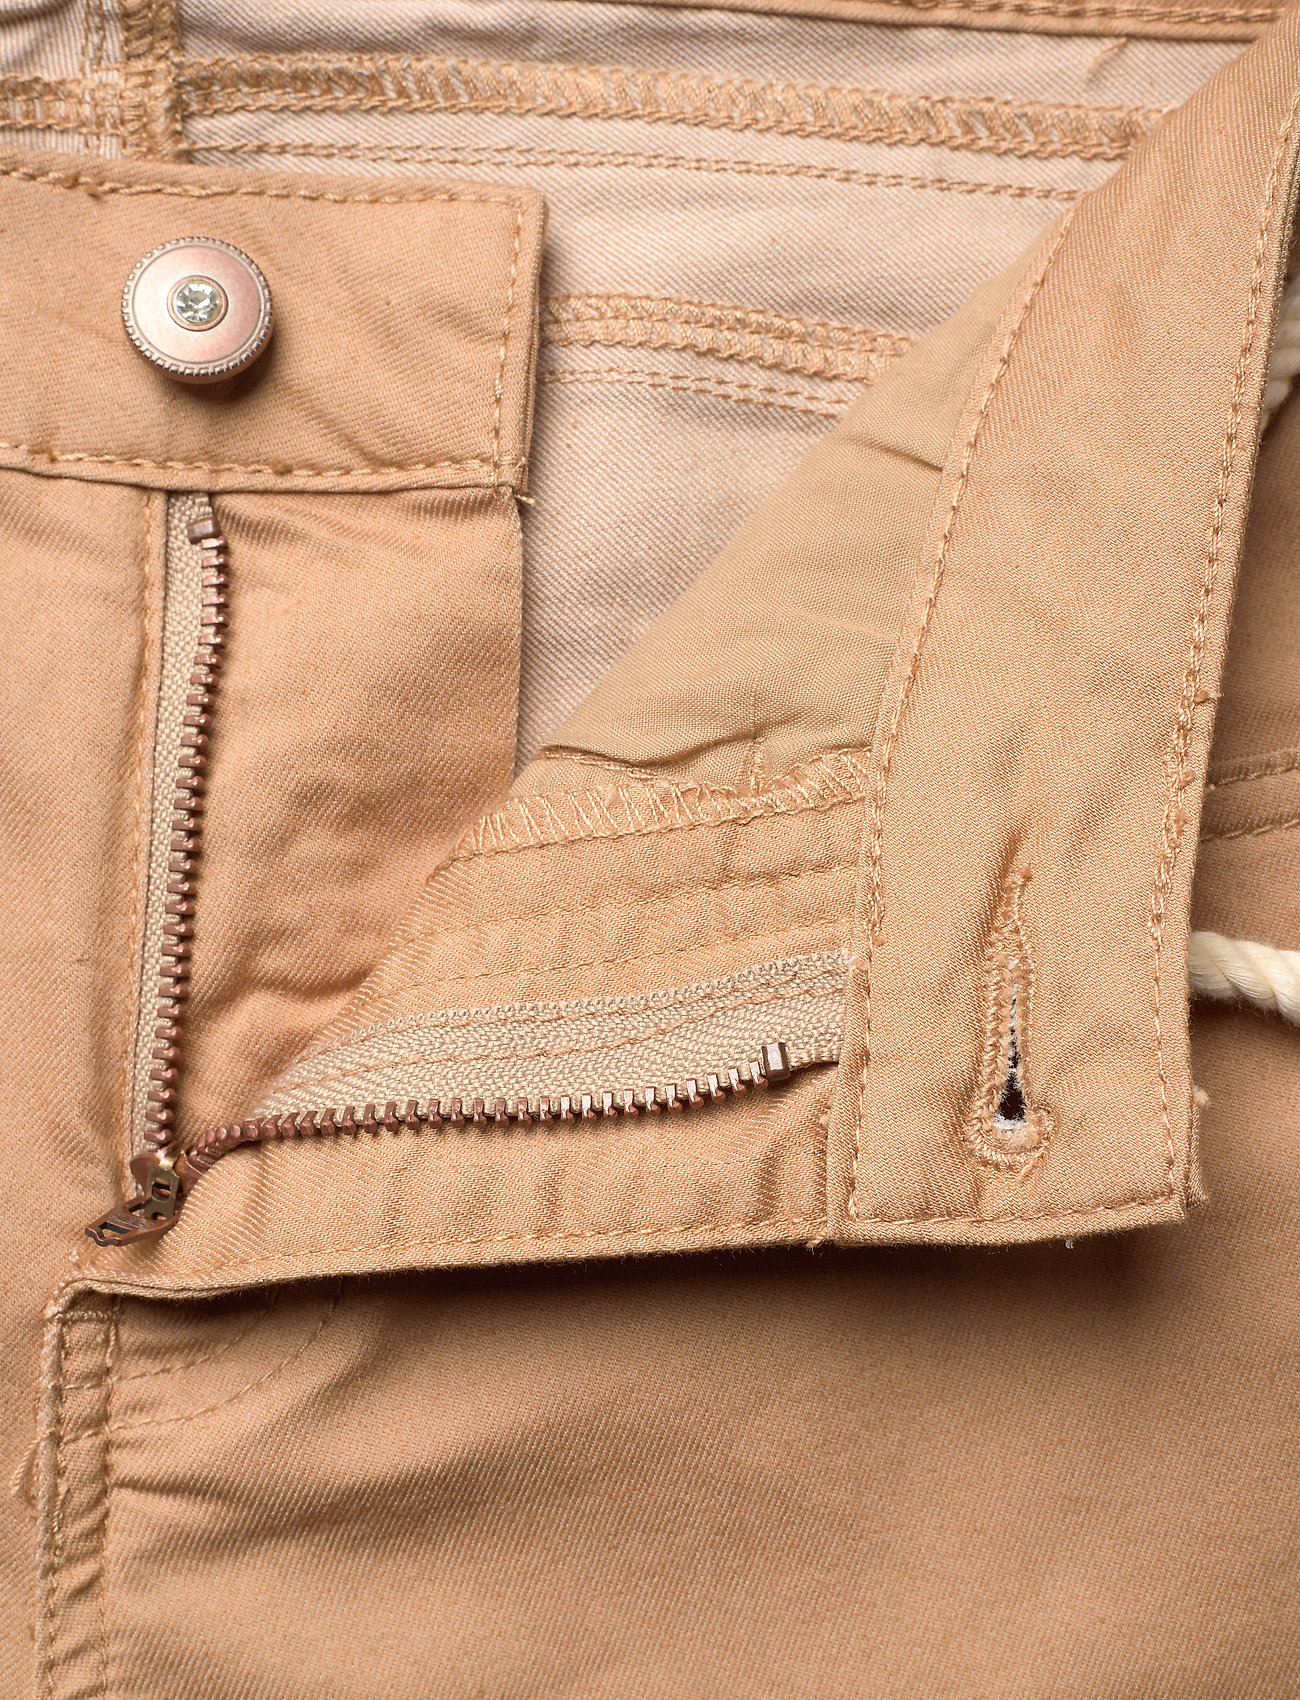 Cream - CRVava Pant 3/4 - Coco Fit - straight regular - tannin - 3